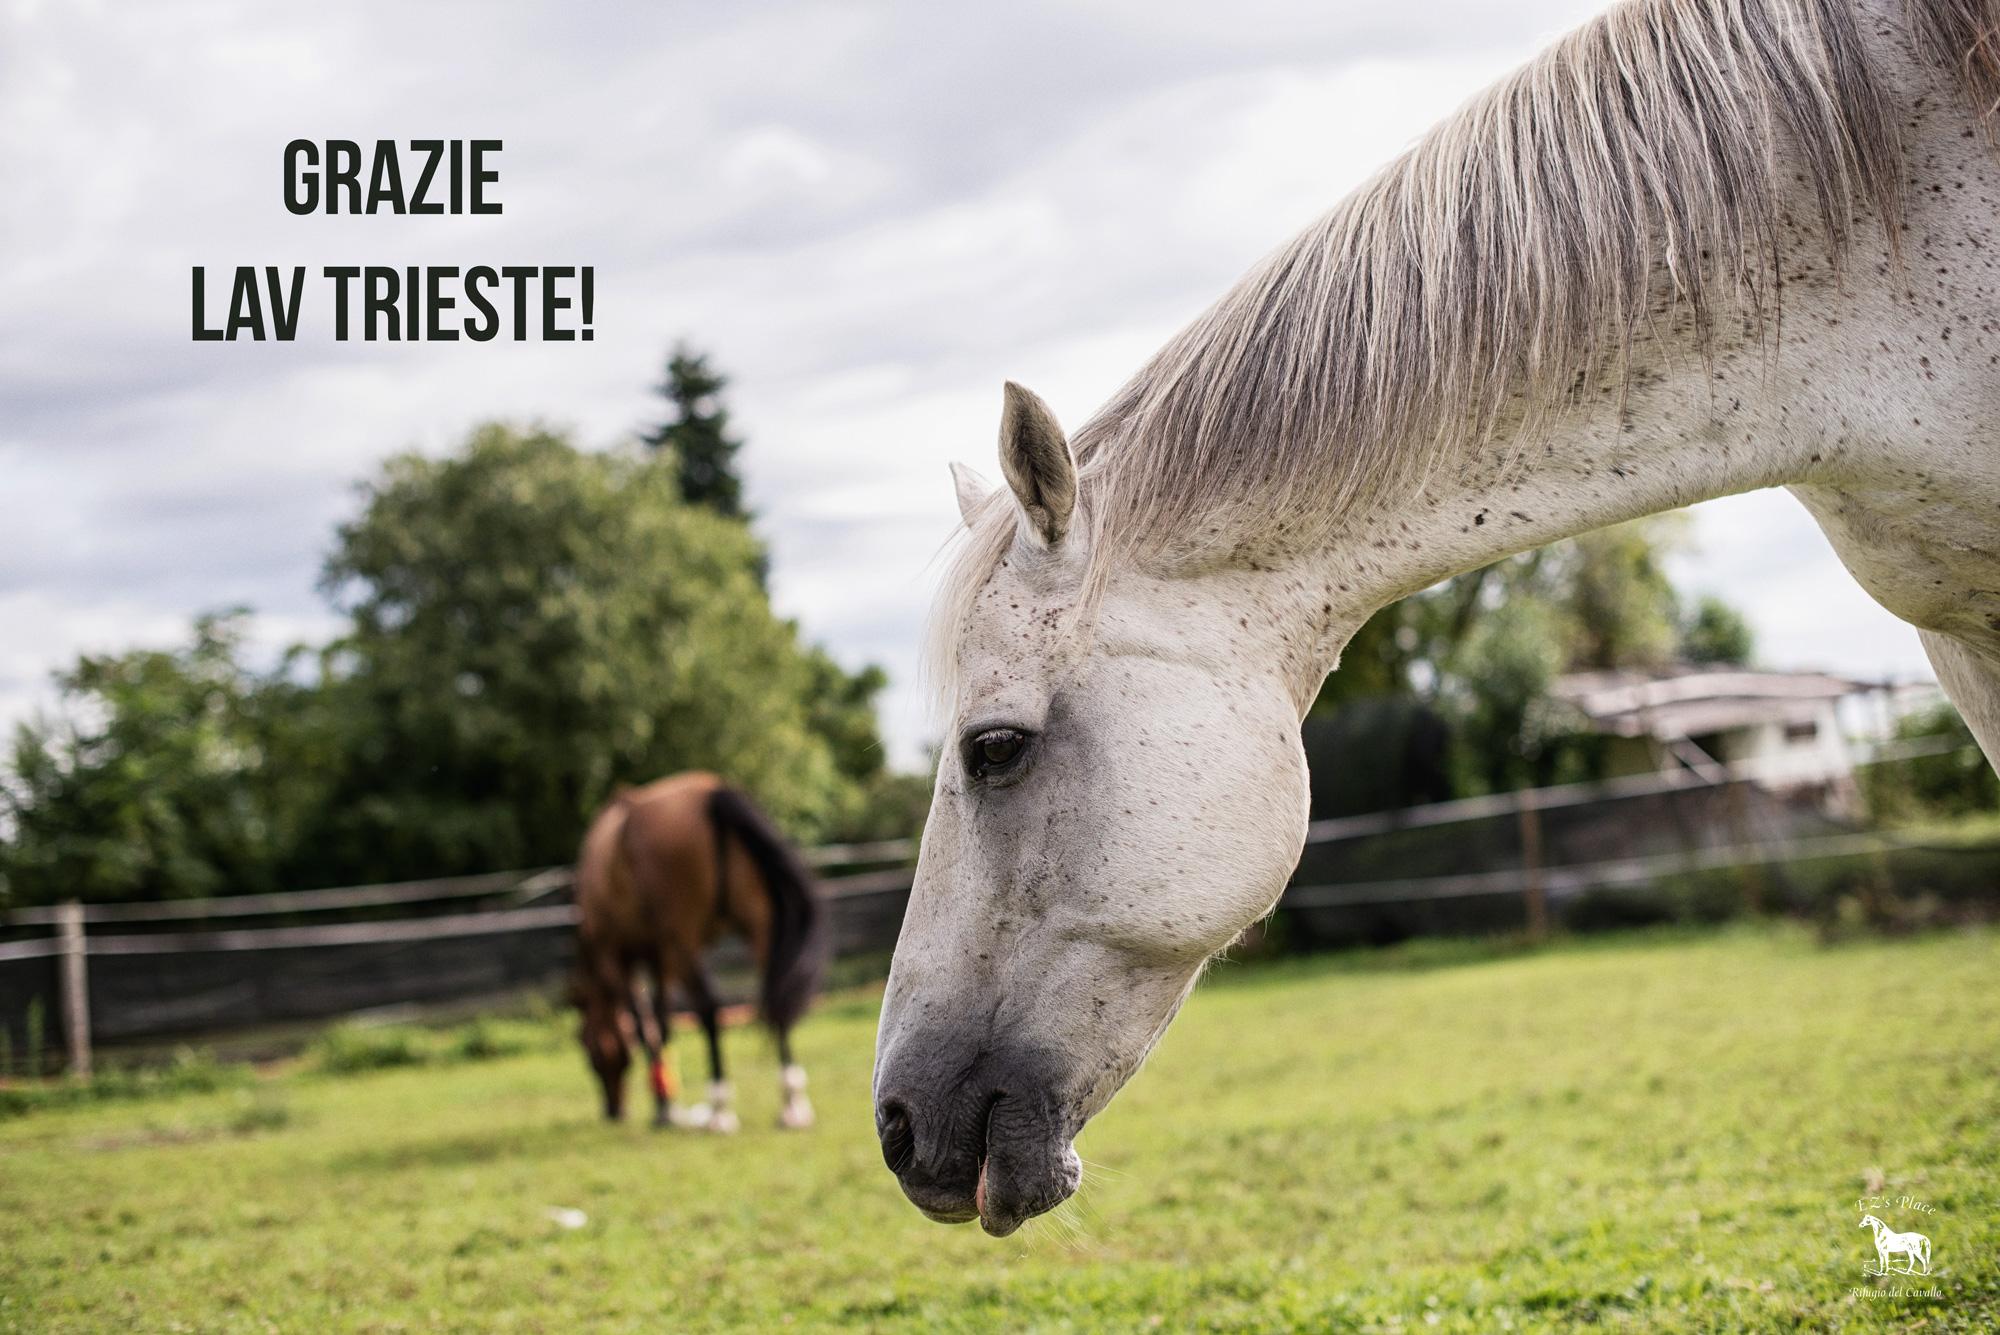 Lucky ringrazia LAV Trieste!